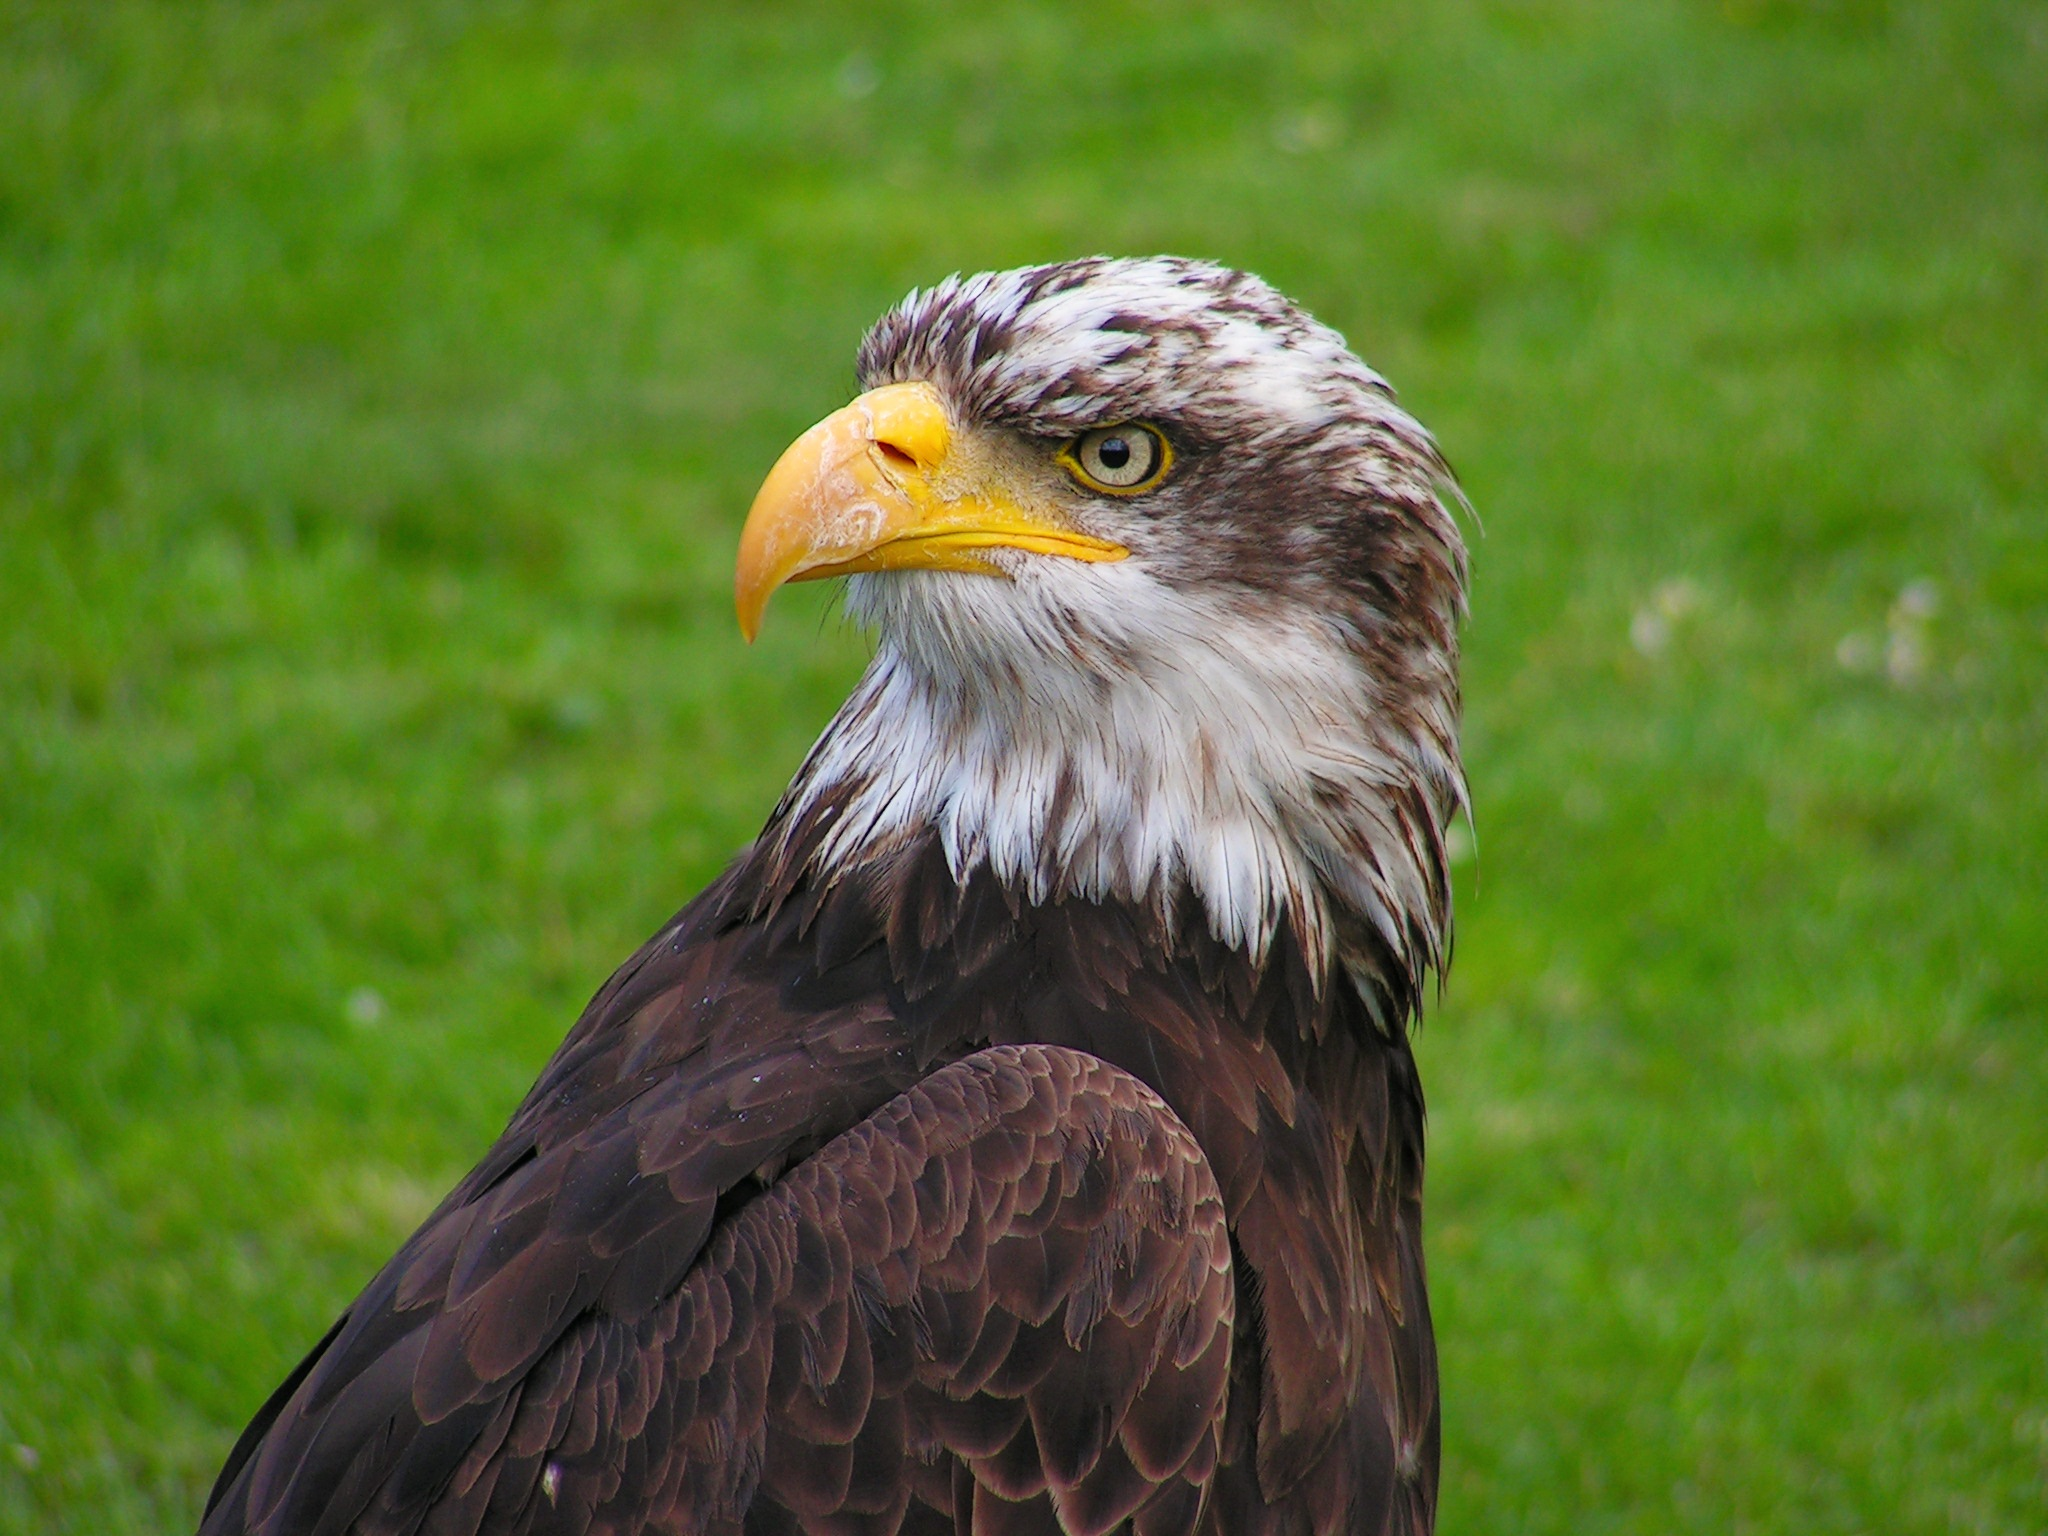 Young Bald Eagle Image